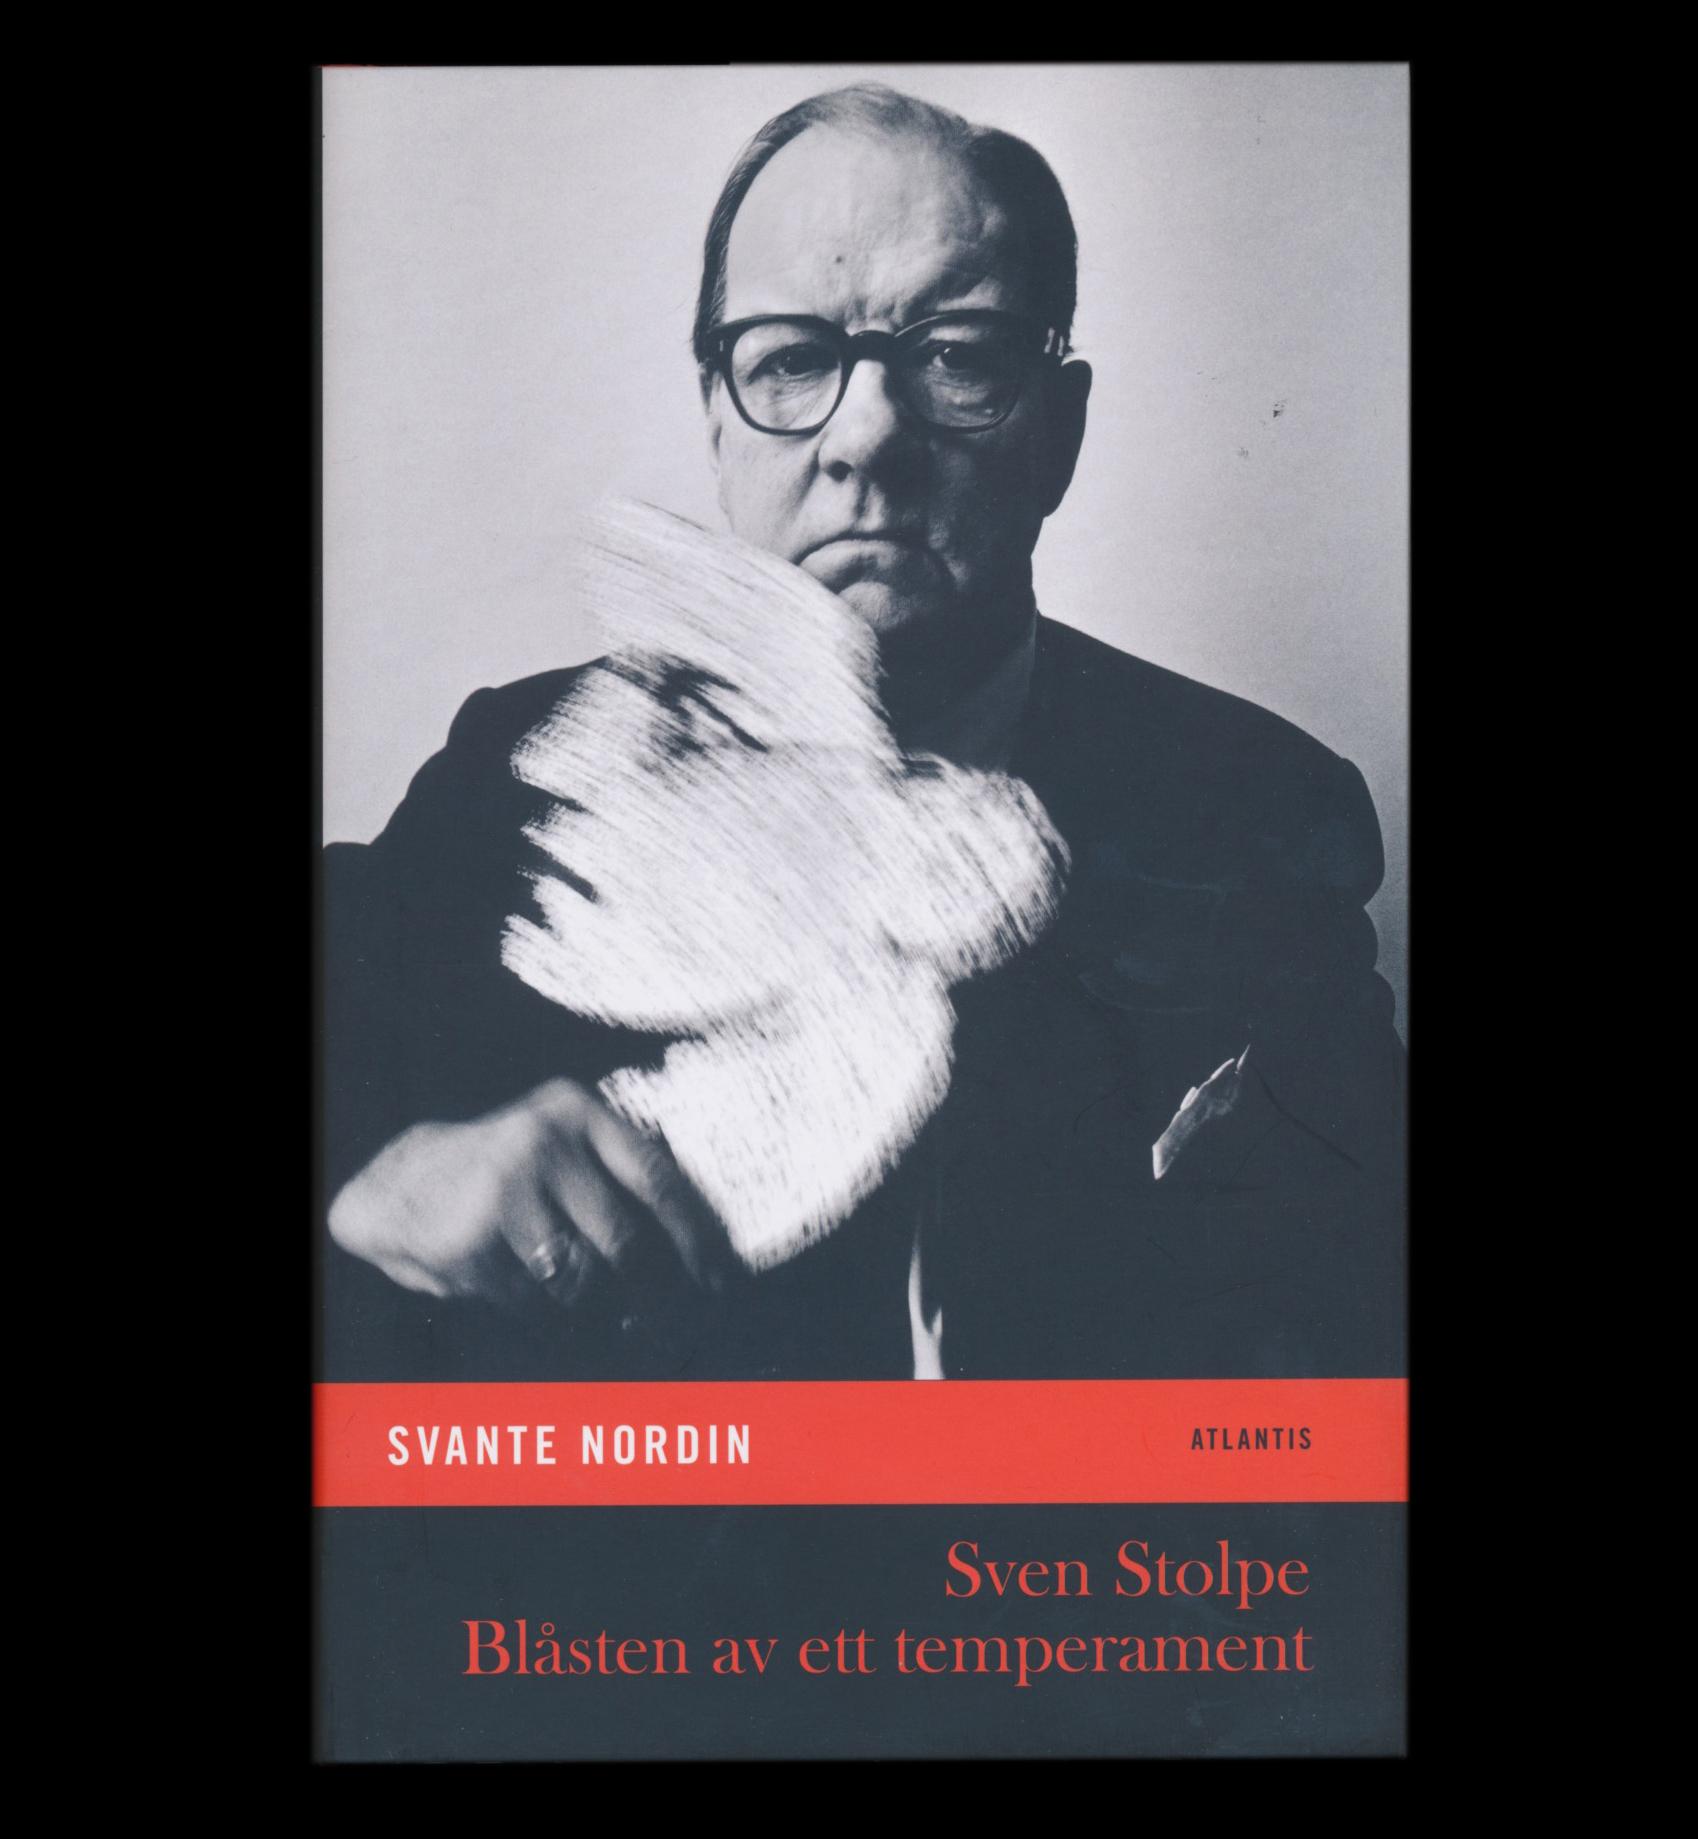 Sven Stolpe – blåsten av ett temperament av Svante Nordin